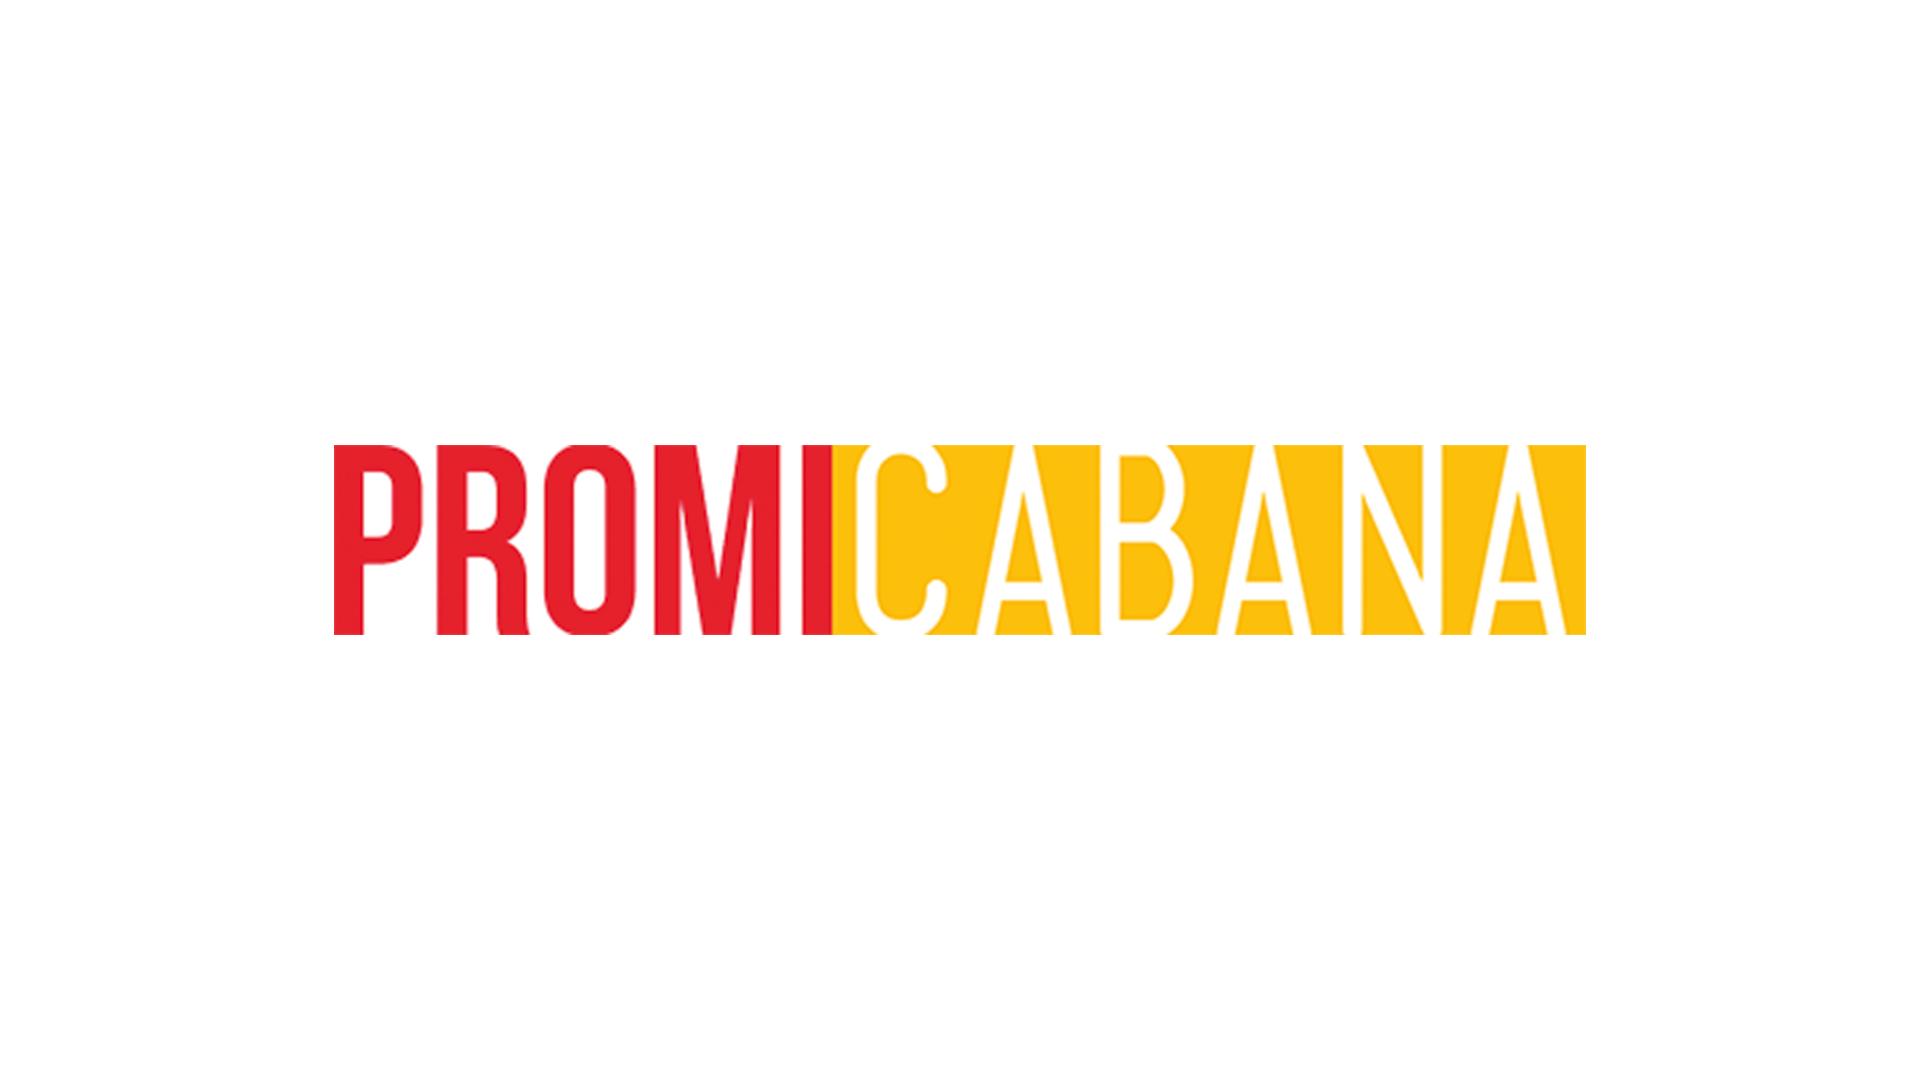 Charlie-Hunnam-King-Arthur-Legend-of-the-Sword-Trailer